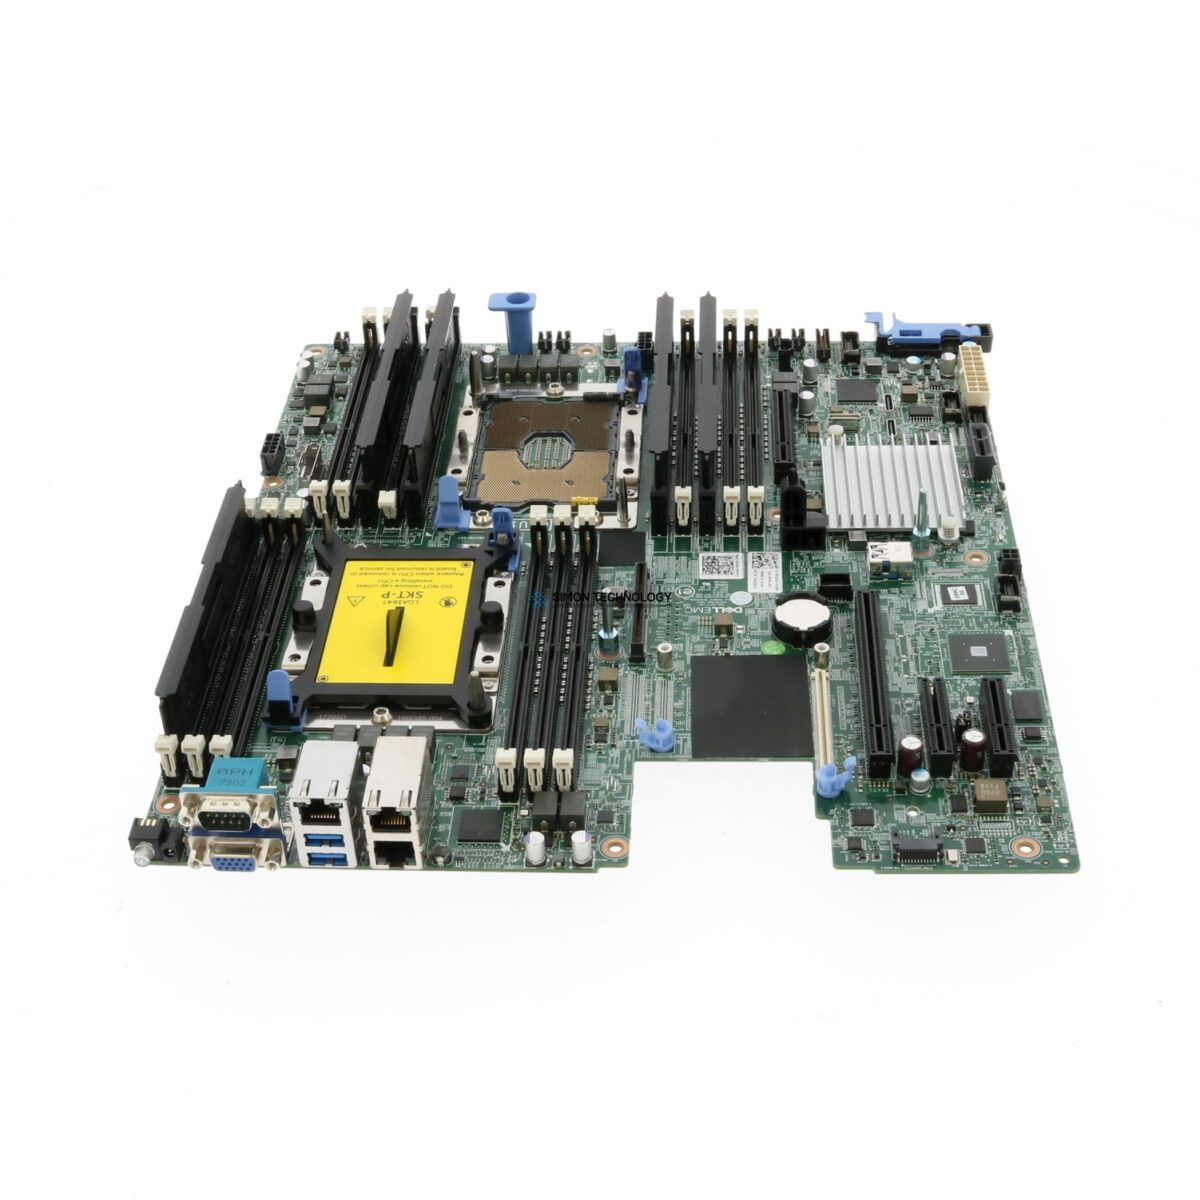 Материнская плата Dell PowerEdge R440 8x2.5 N28XX Ask for custom qoute (PER440-SFF-8-N28XX)